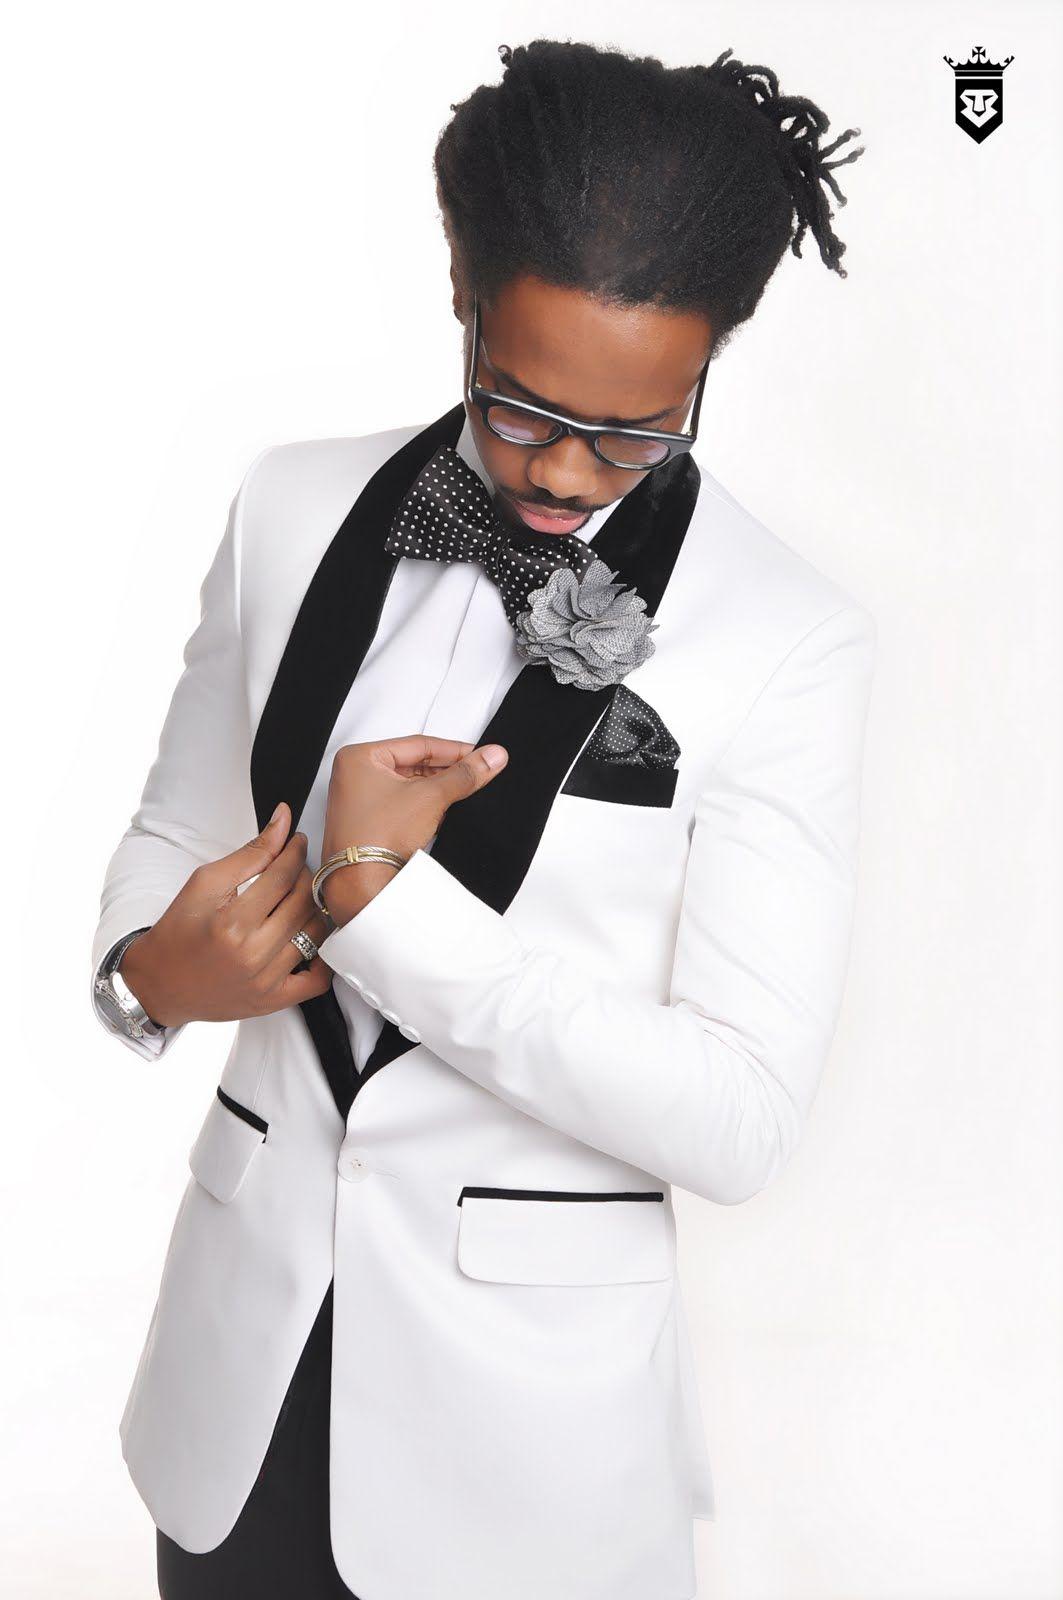 sheria-ngowi-churchill-bow-white-dinner-jacket-black-satin-lapel.jpg ...